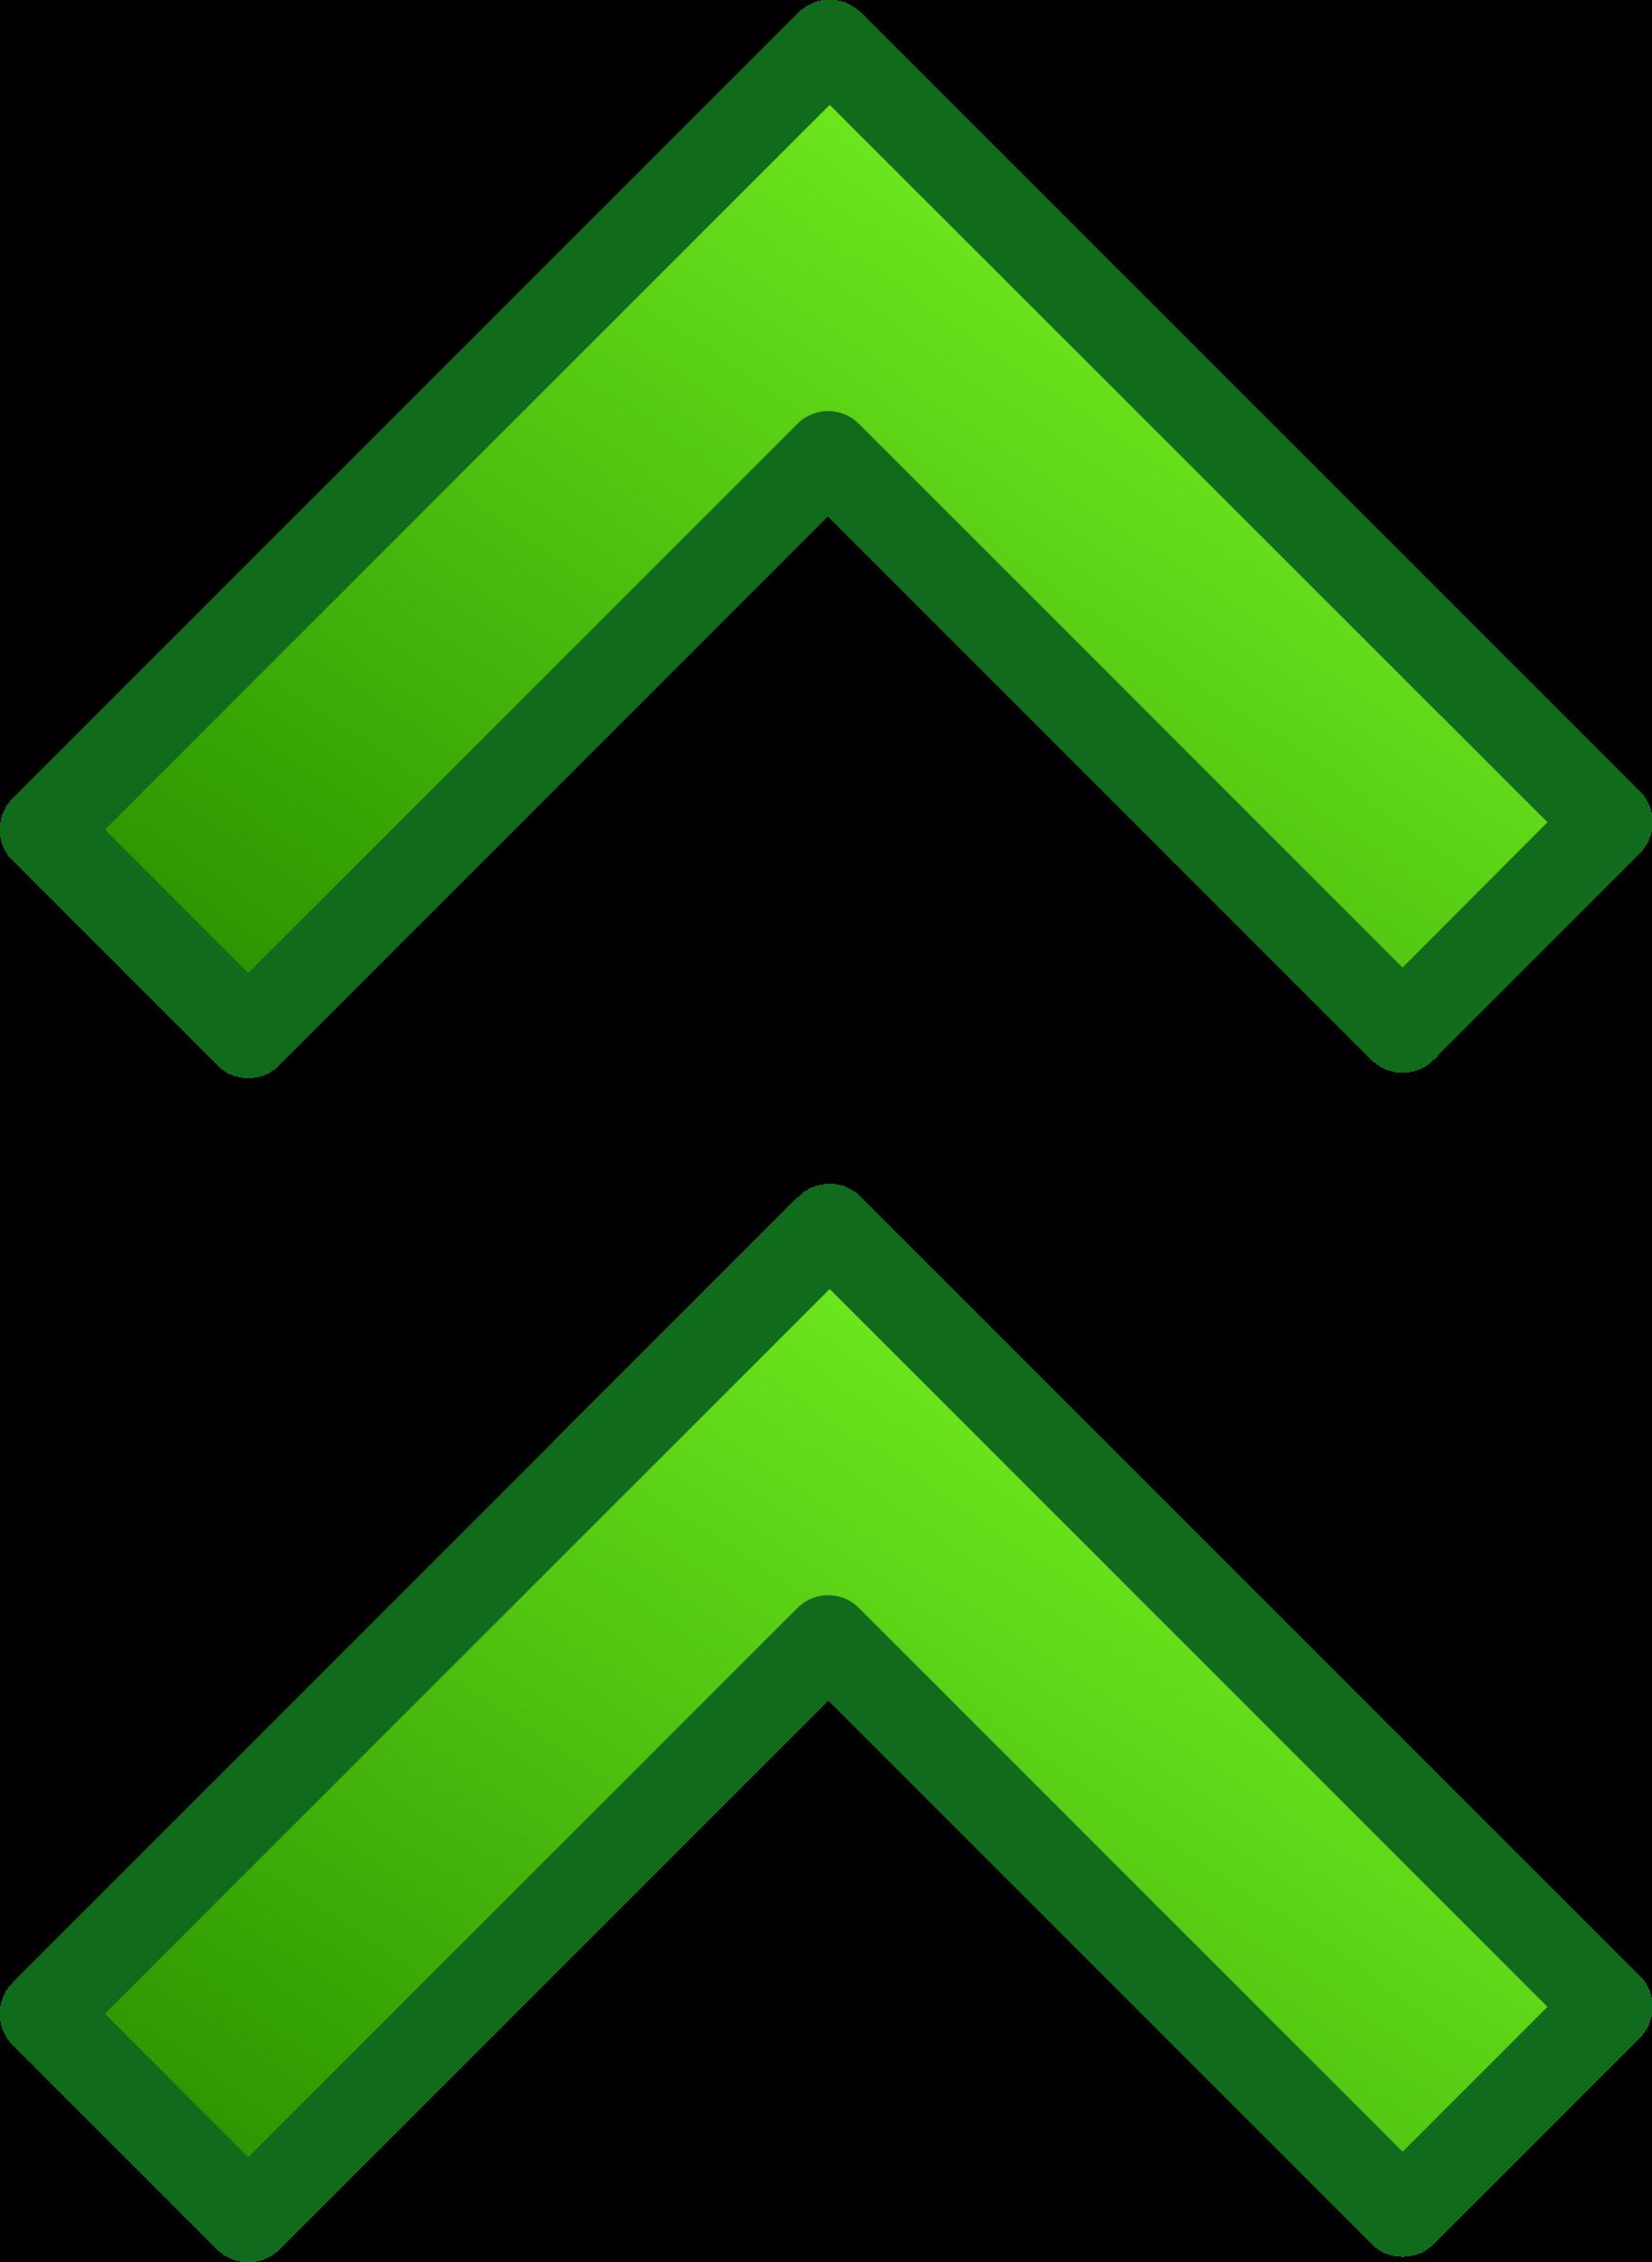 svg free stock Double arrow clipart. Green arrows set big